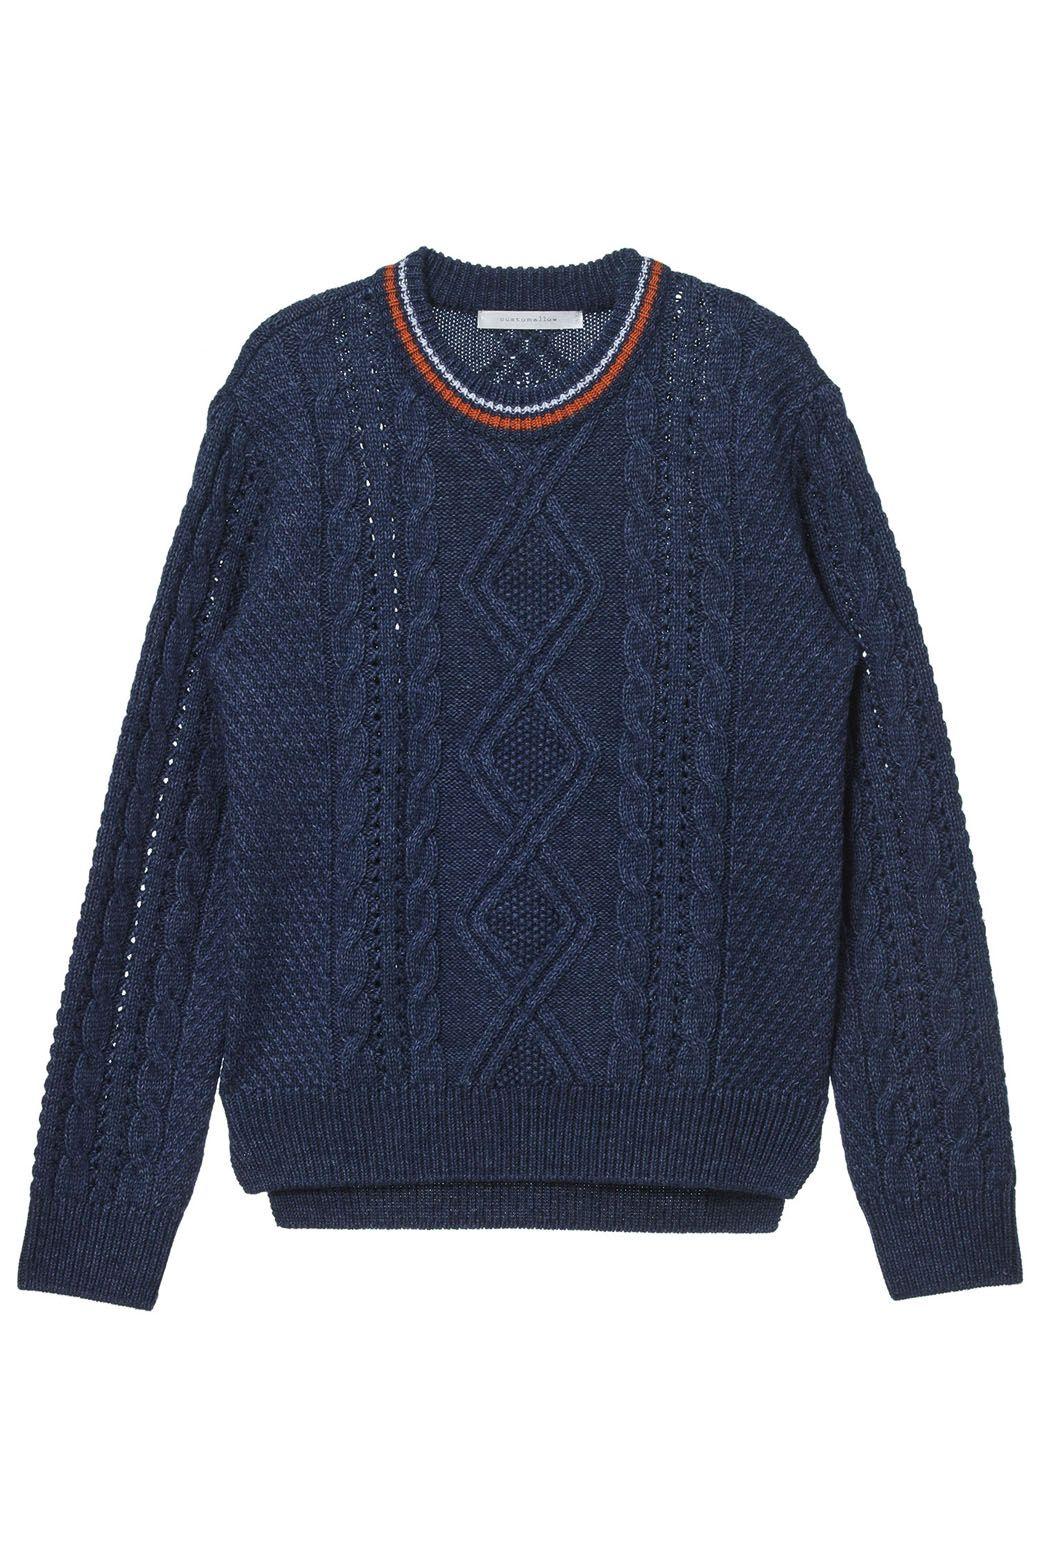 [customellow] [women] twisted roundneck sweater > 니트 > FEMALE > joykolon